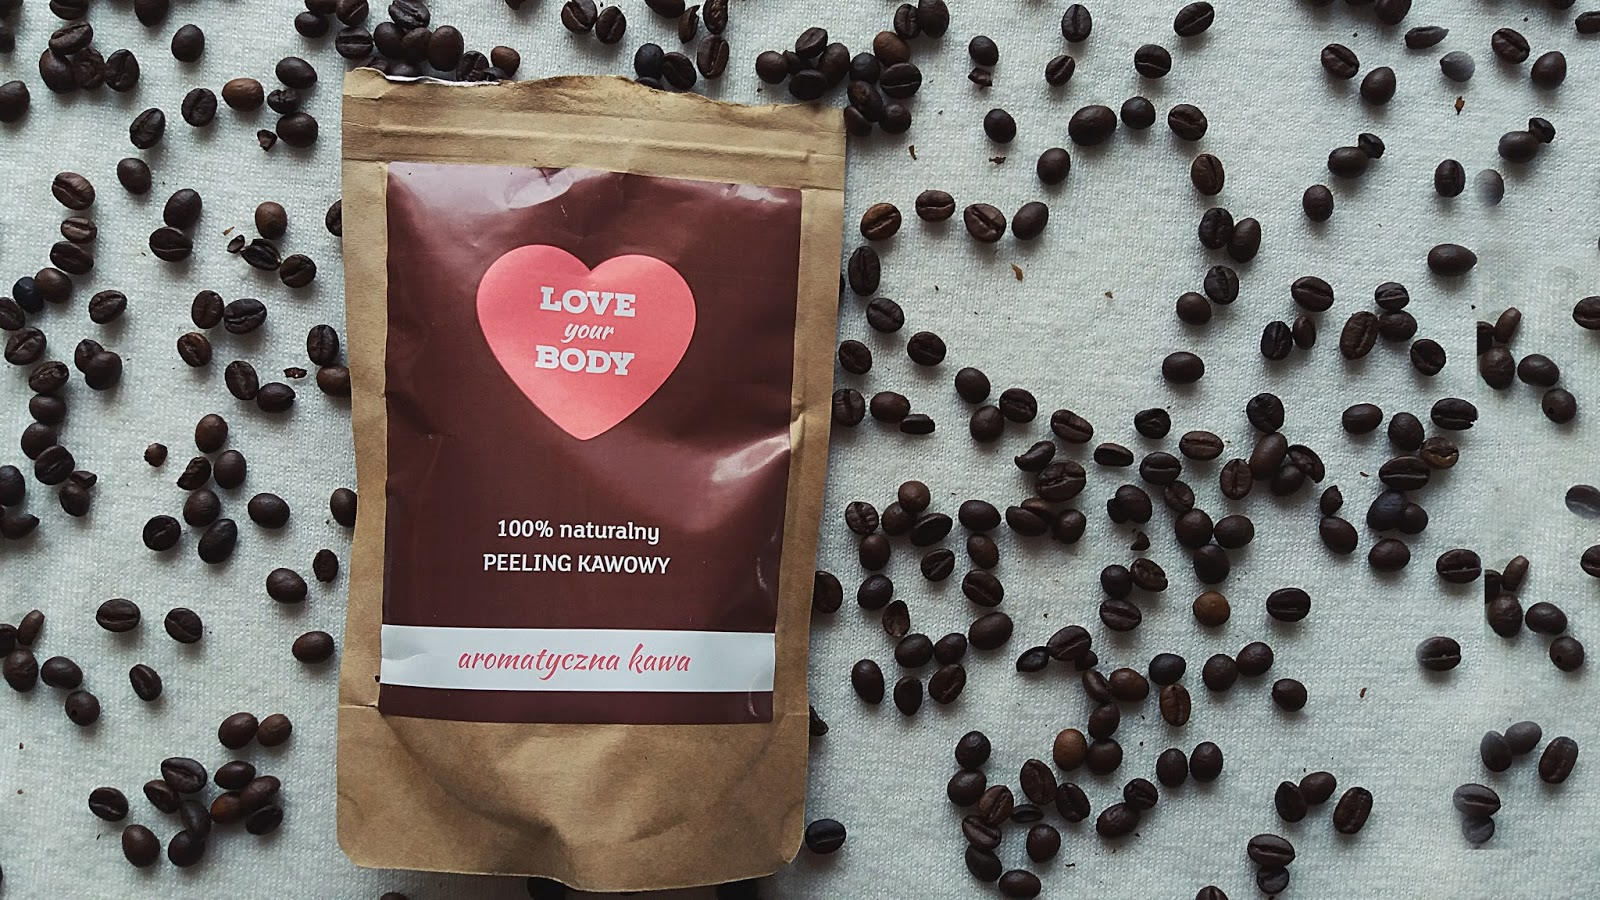 Peeling kawowy Love Your Body